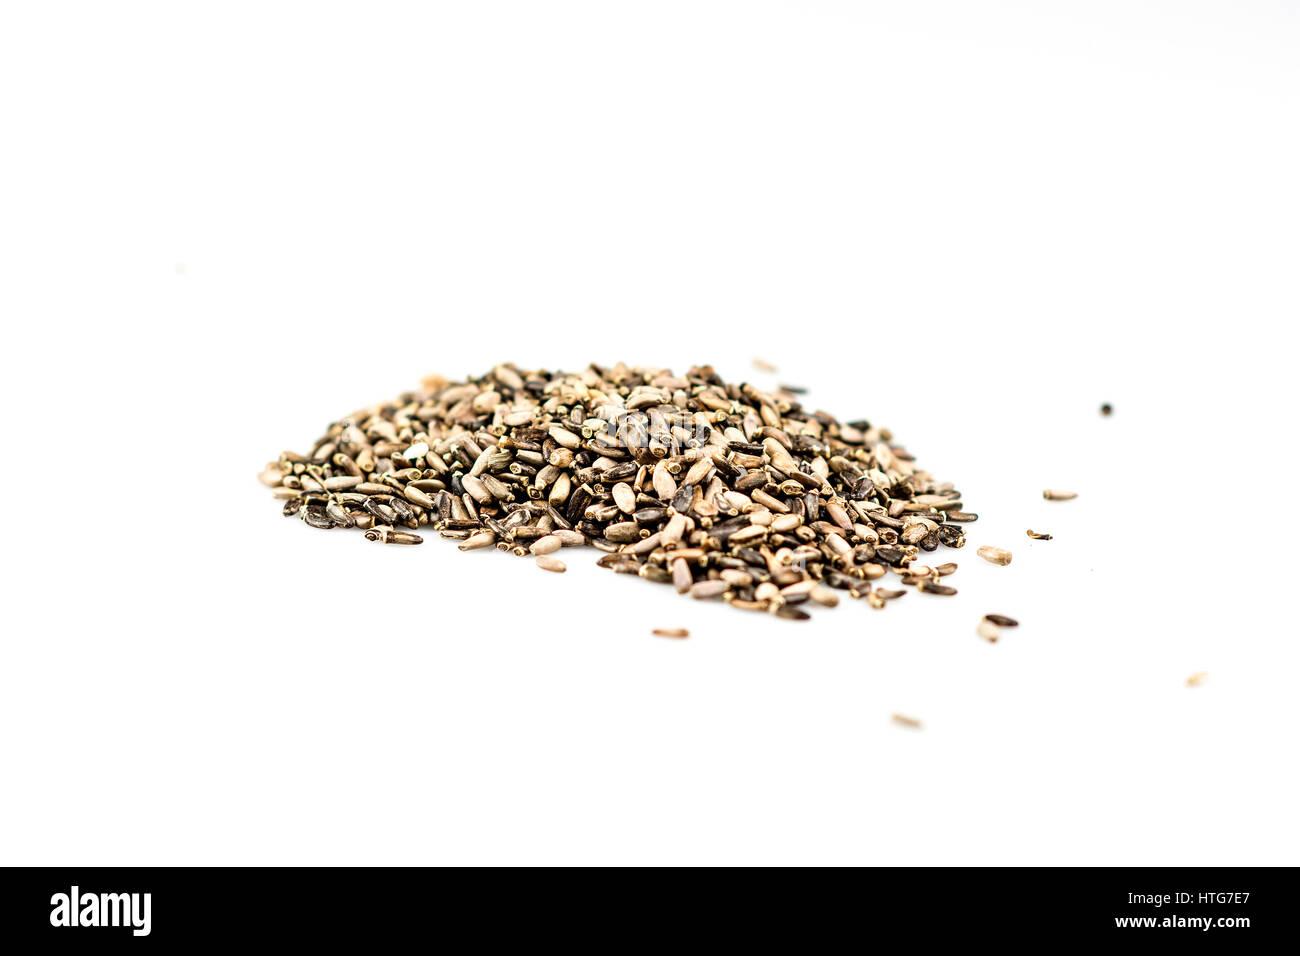 Milk Thistle Seed - Stock Image